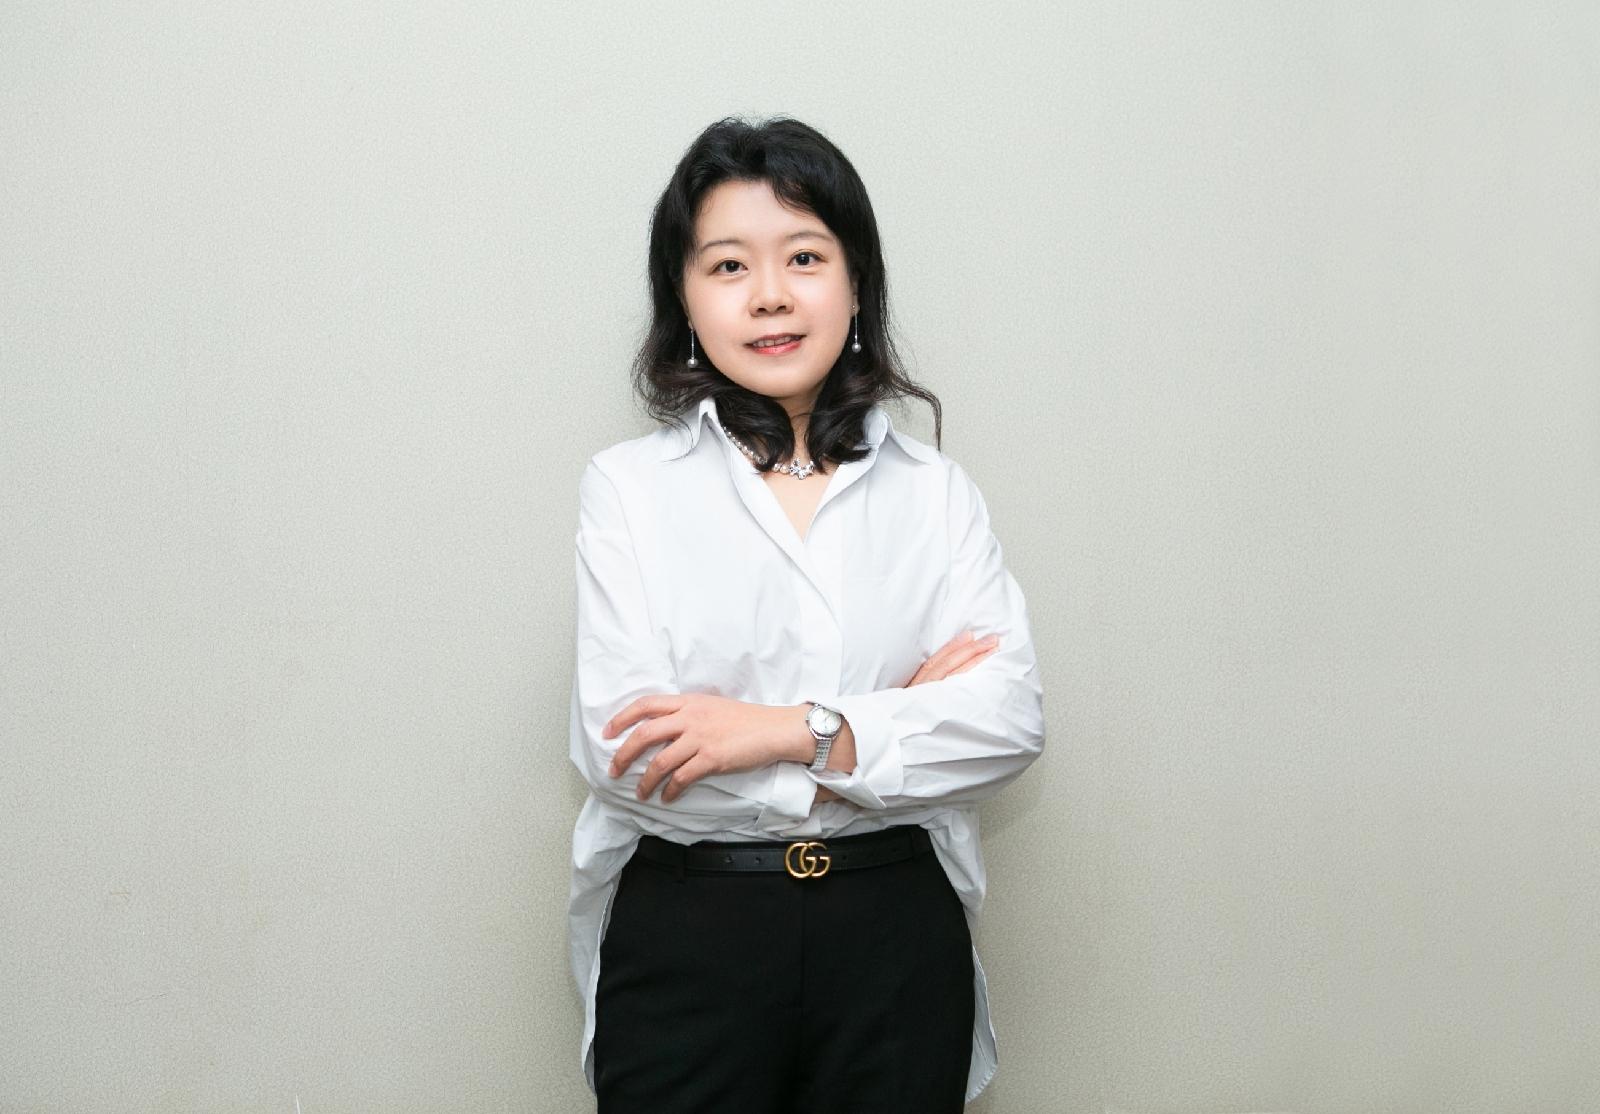 Lazada ประเทศไทย แต่งตั้งประธานเจ้าหน้าที่บริหารหญิงคนแรกของประเทศไทยเสริมแกร่งกลยุทธ์เดินหน้าสู่เป้าหมายธุรกิจ